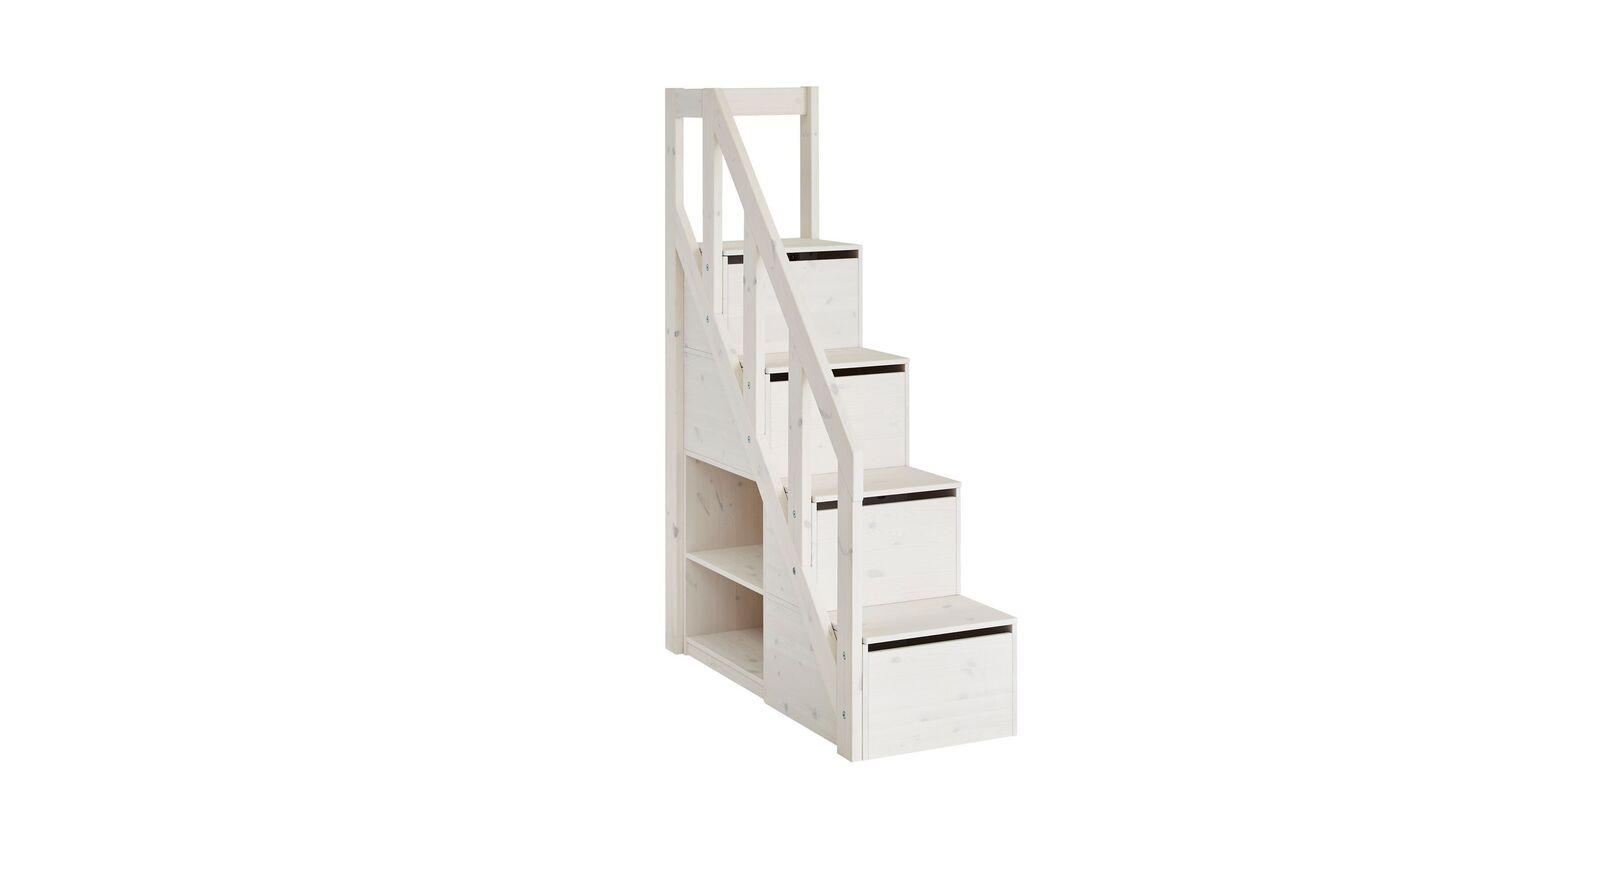 LIFETIME Familienbett Original mit 178 cm hohem Treppenmodul